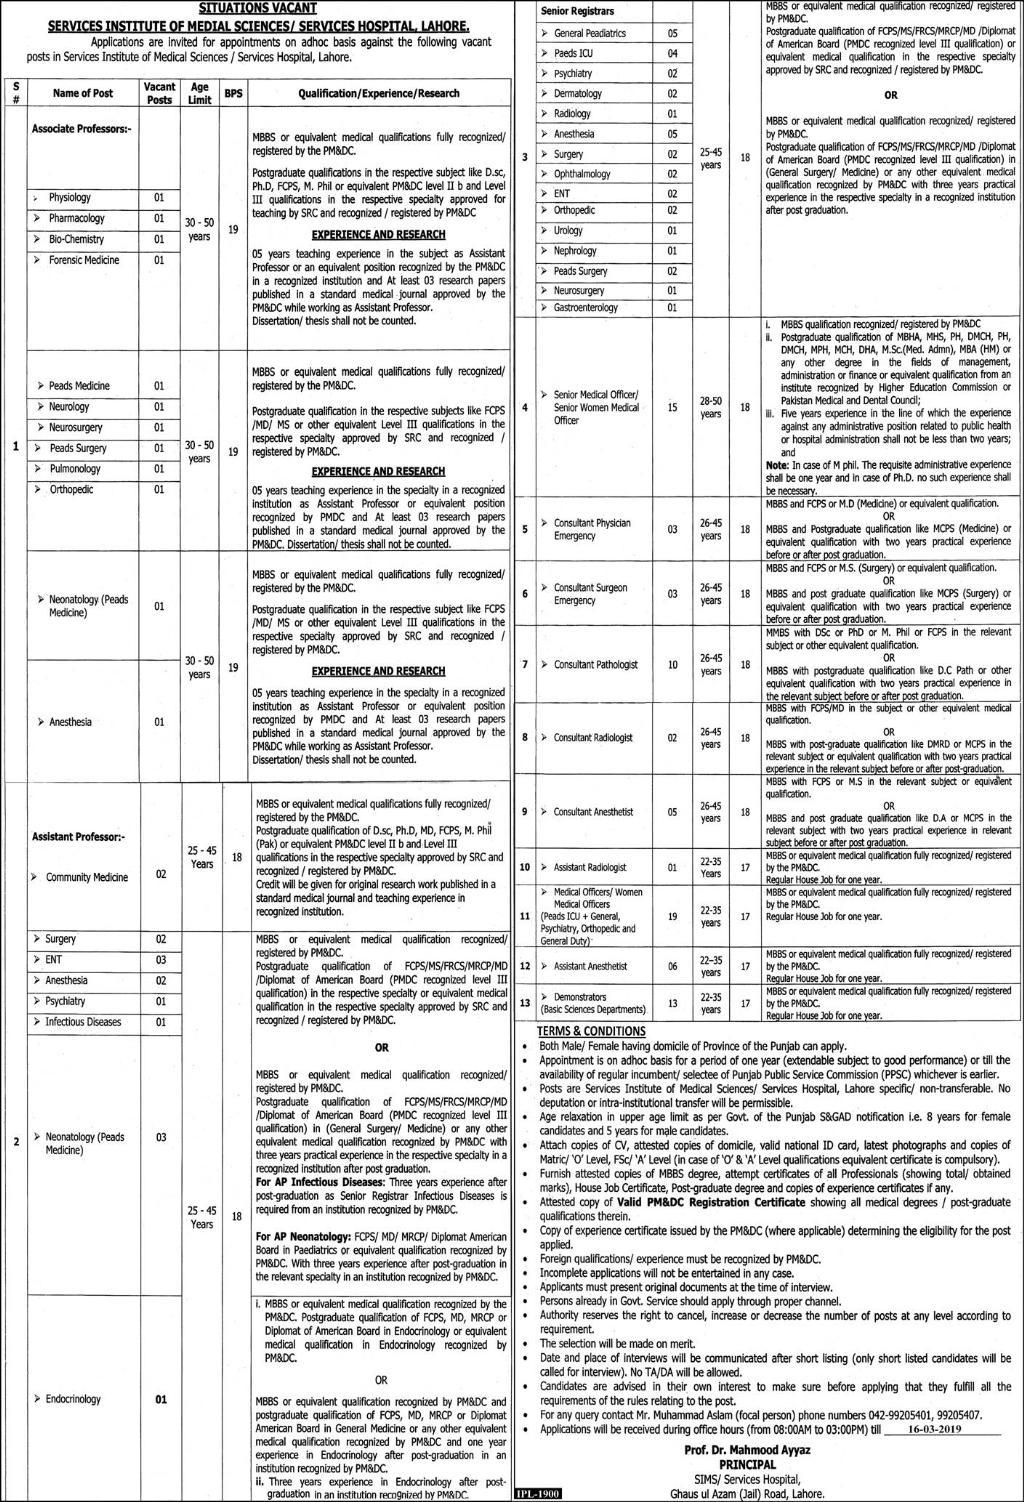 Services Institute of Medical Sciences jobs 2019